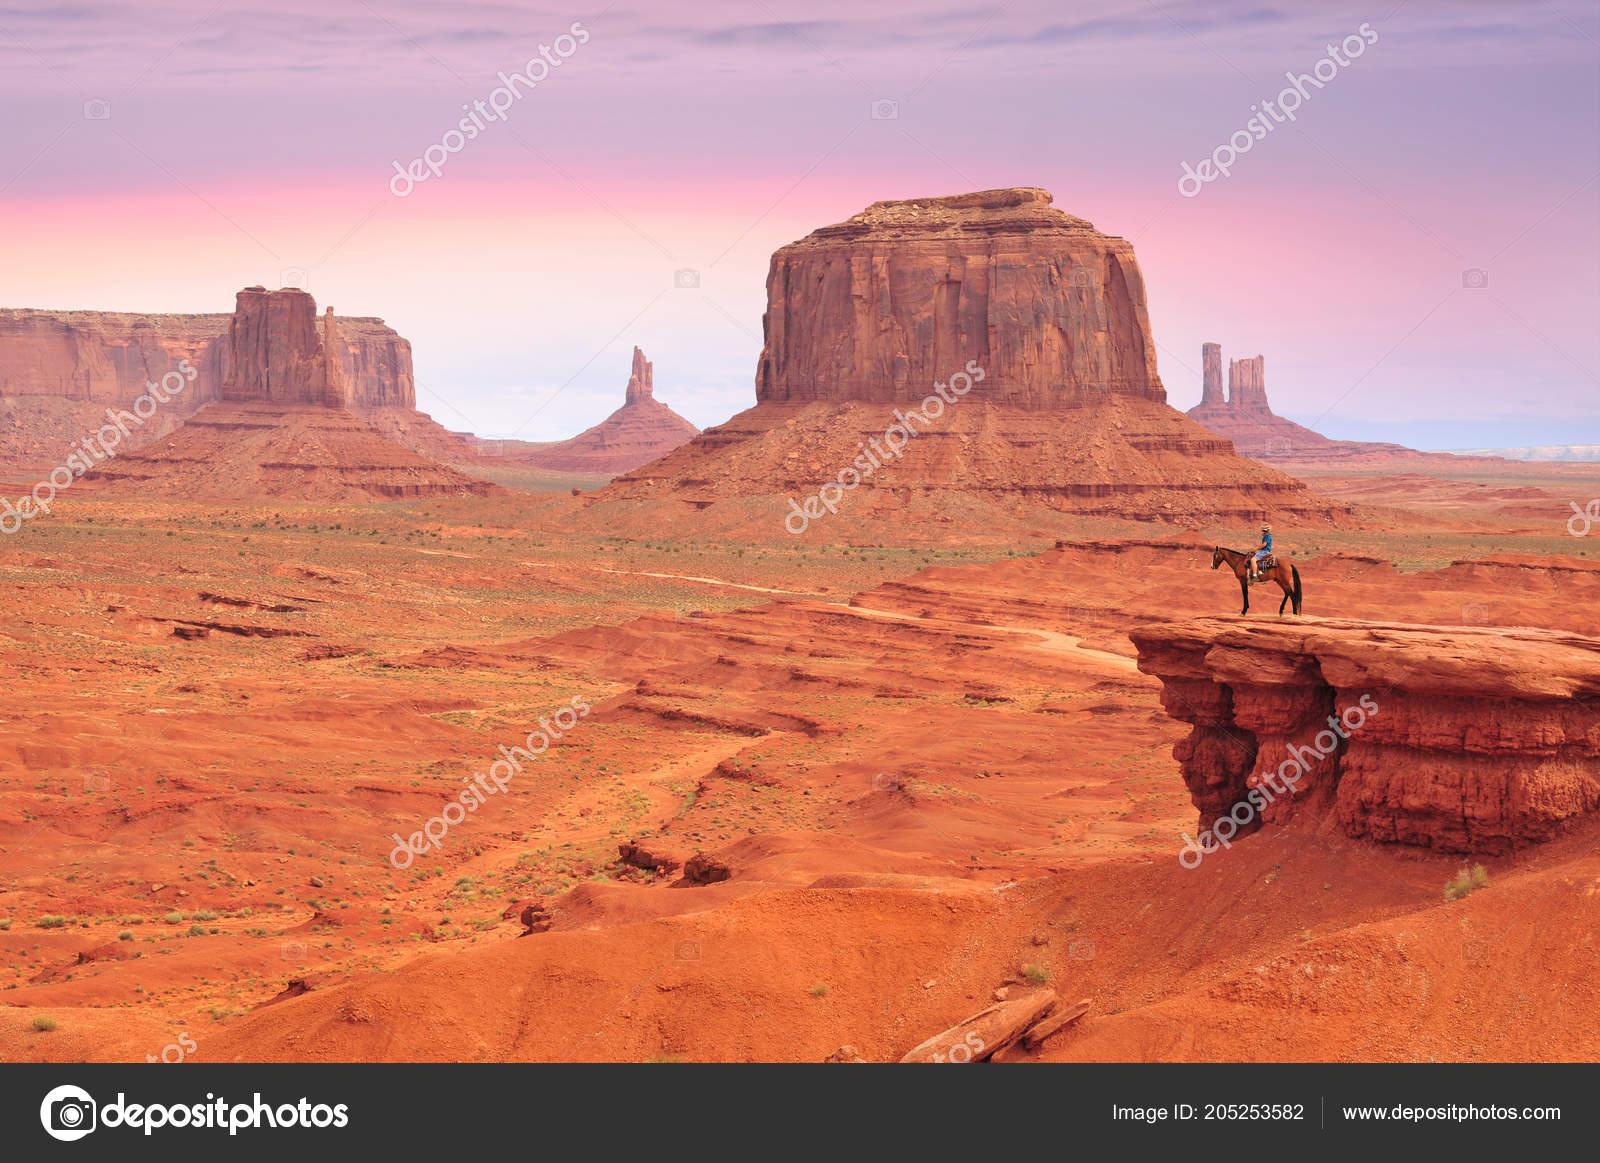 Homme Sur Cheval Vue John Ford Point Monument Valley Avec